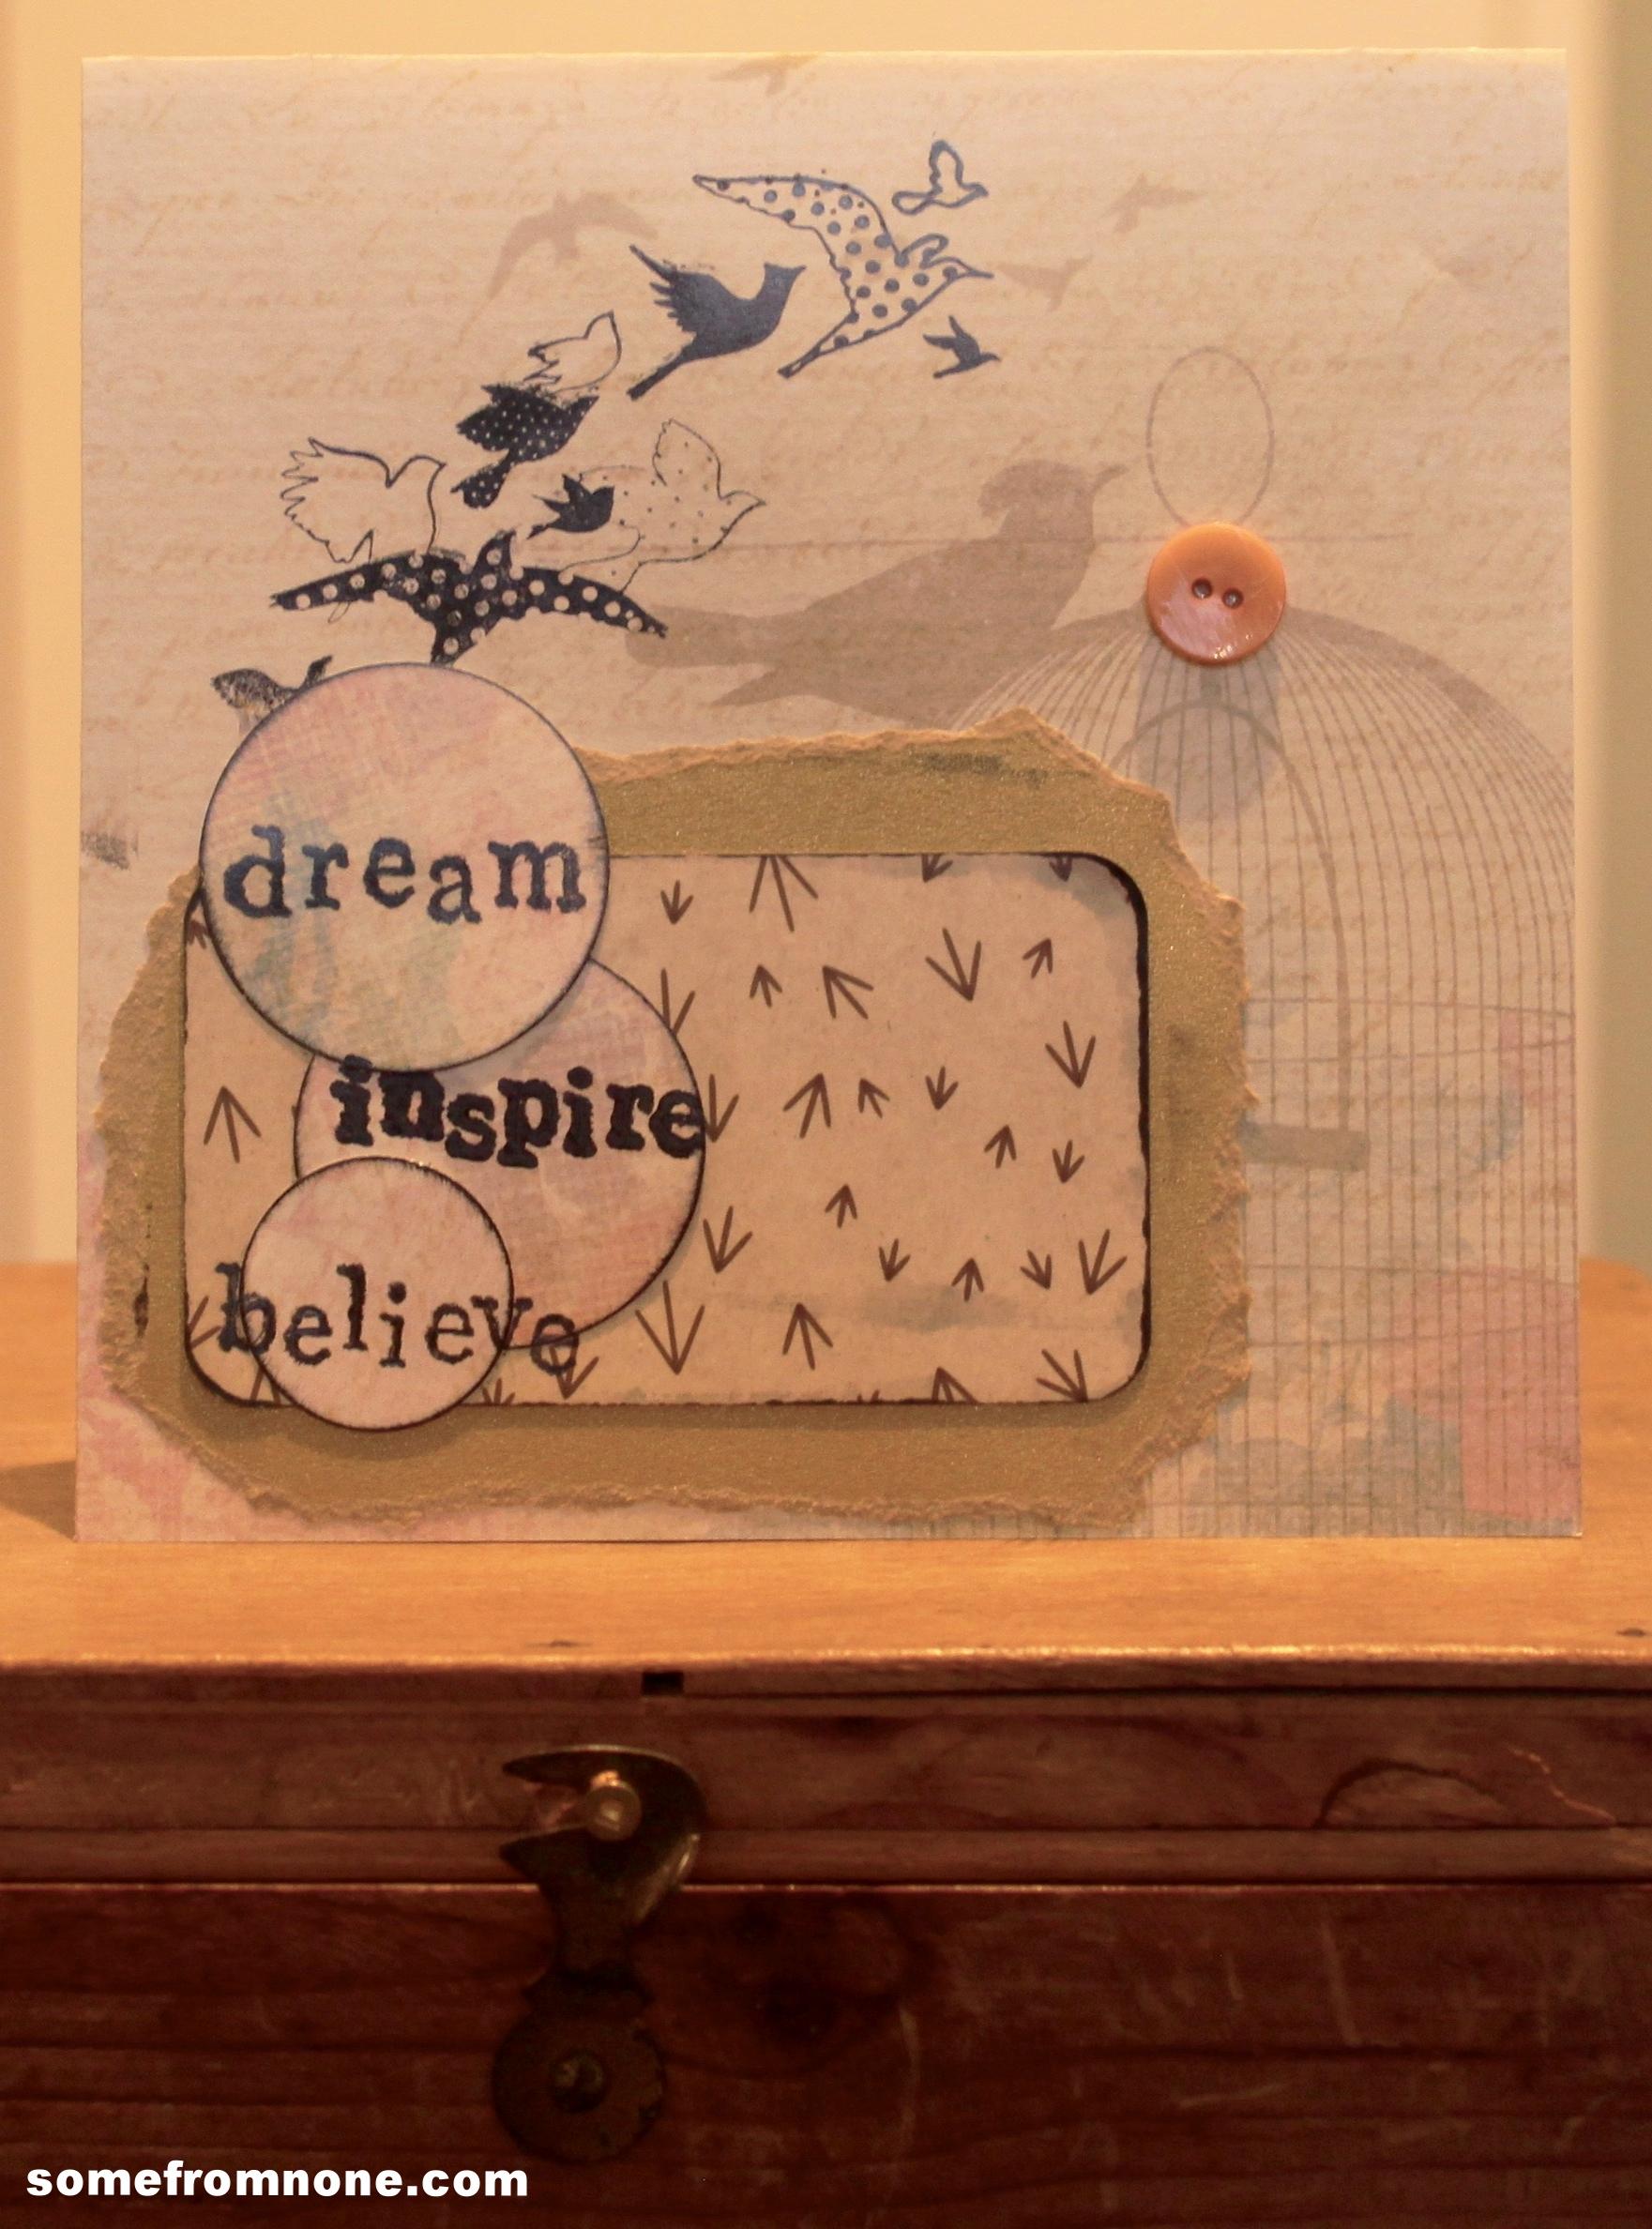 Dream, Inspire, Believe